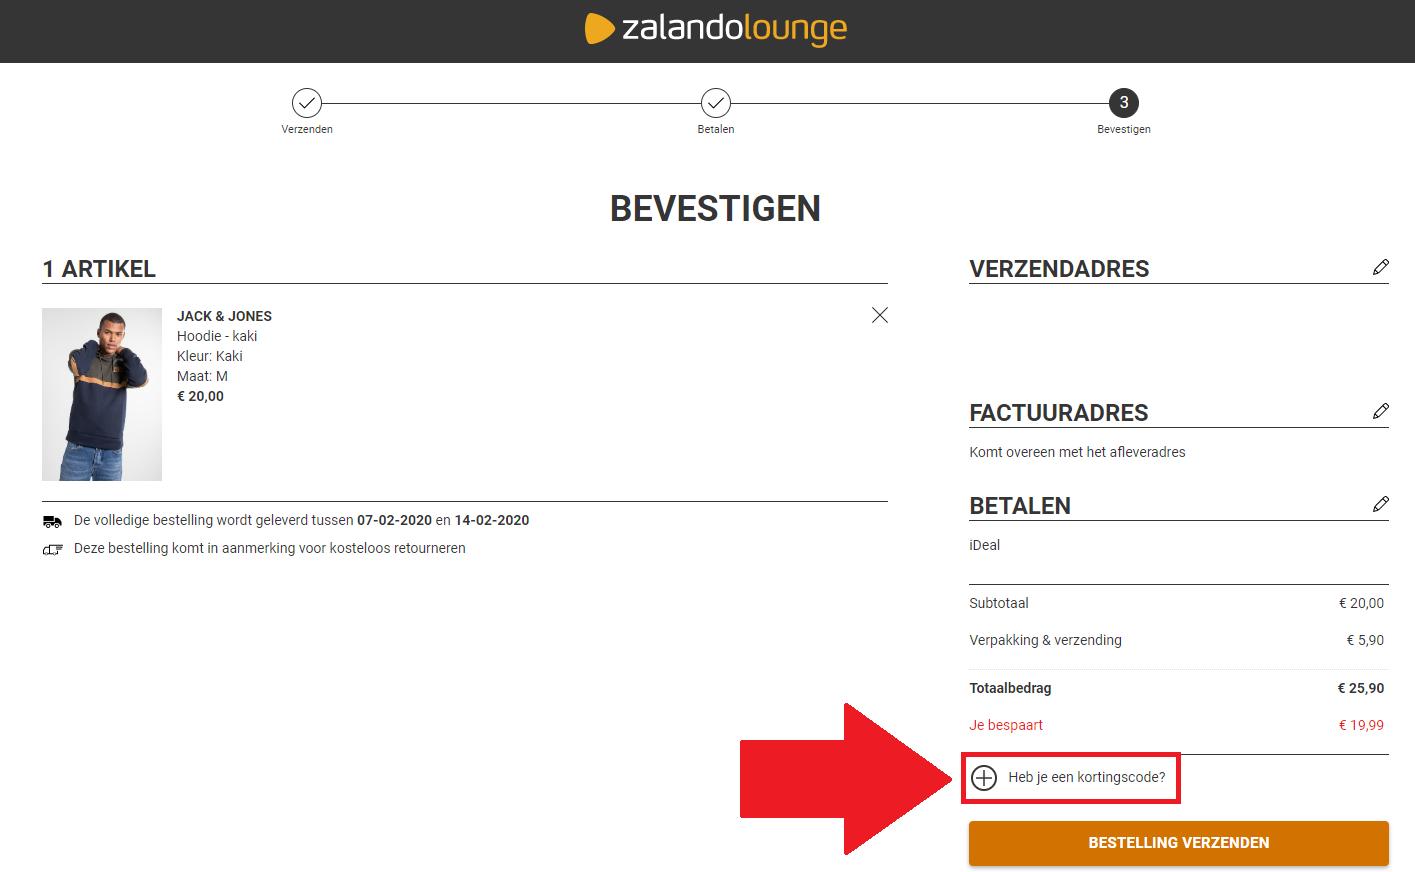 Zalando lounge kortingscode ➤ 75% korting + €10 extra